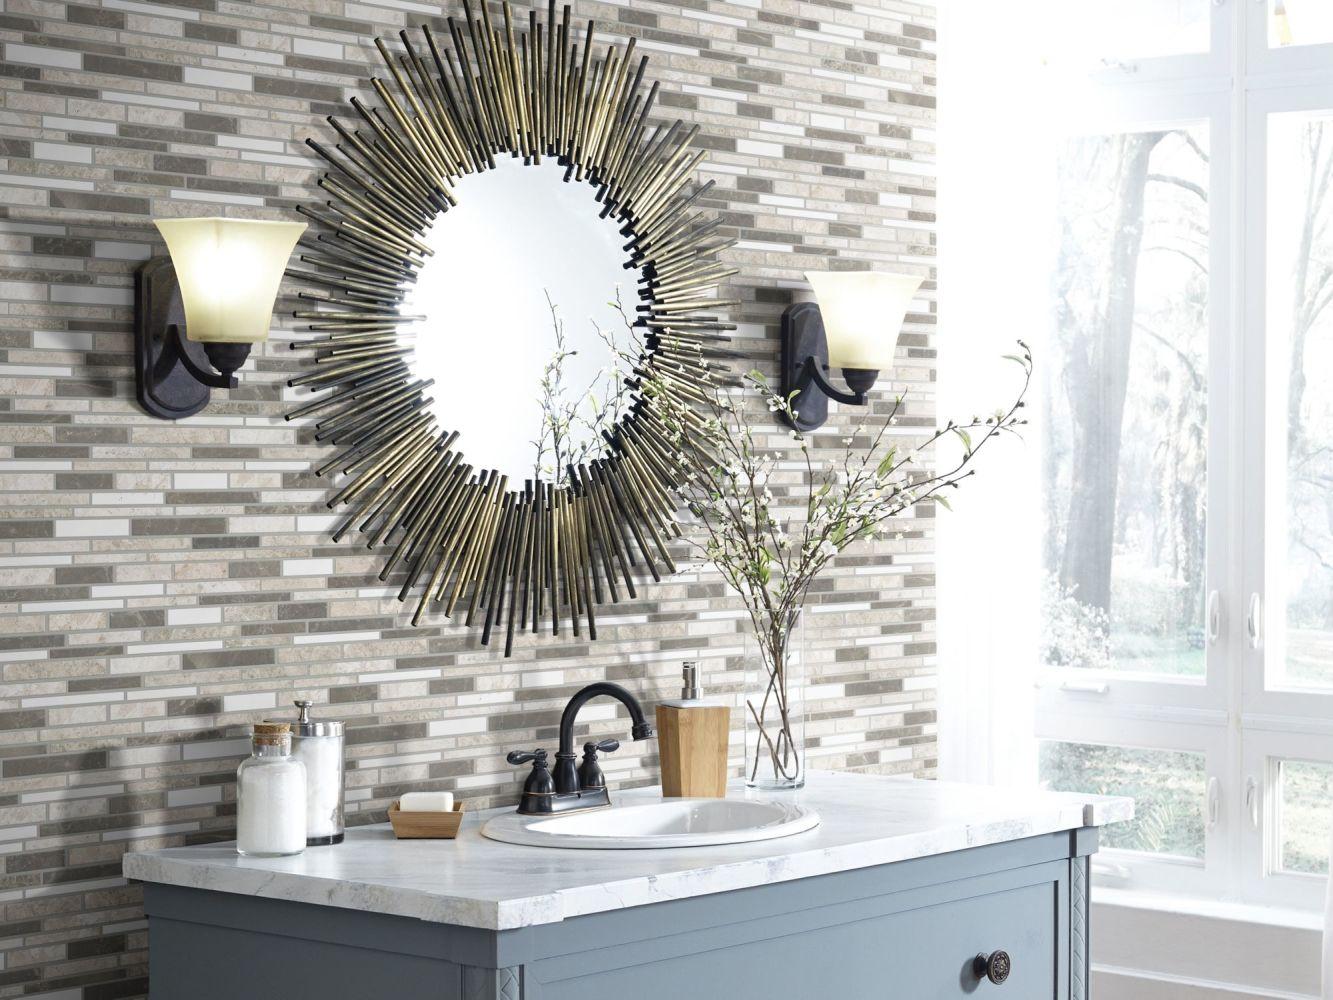 Shaw Floors Home Fn Gold Ceramic Del Ray Random Linear Mosaic Jetty 00151_TGN14